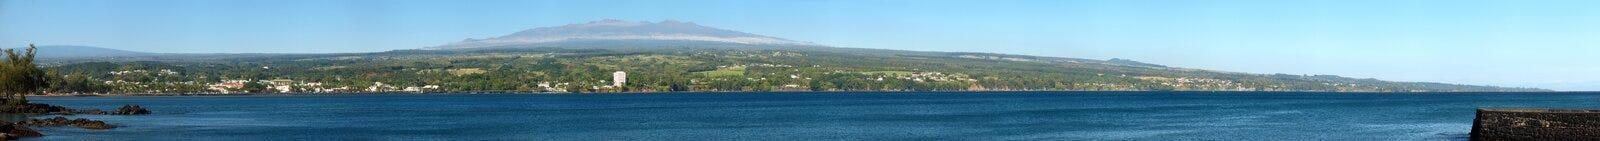 Mauna Kea Panorama. Cloudless panorama of Mauna Loa, Hilo, Mauna Kea and Hilo Bay Royalty Free Stock Image